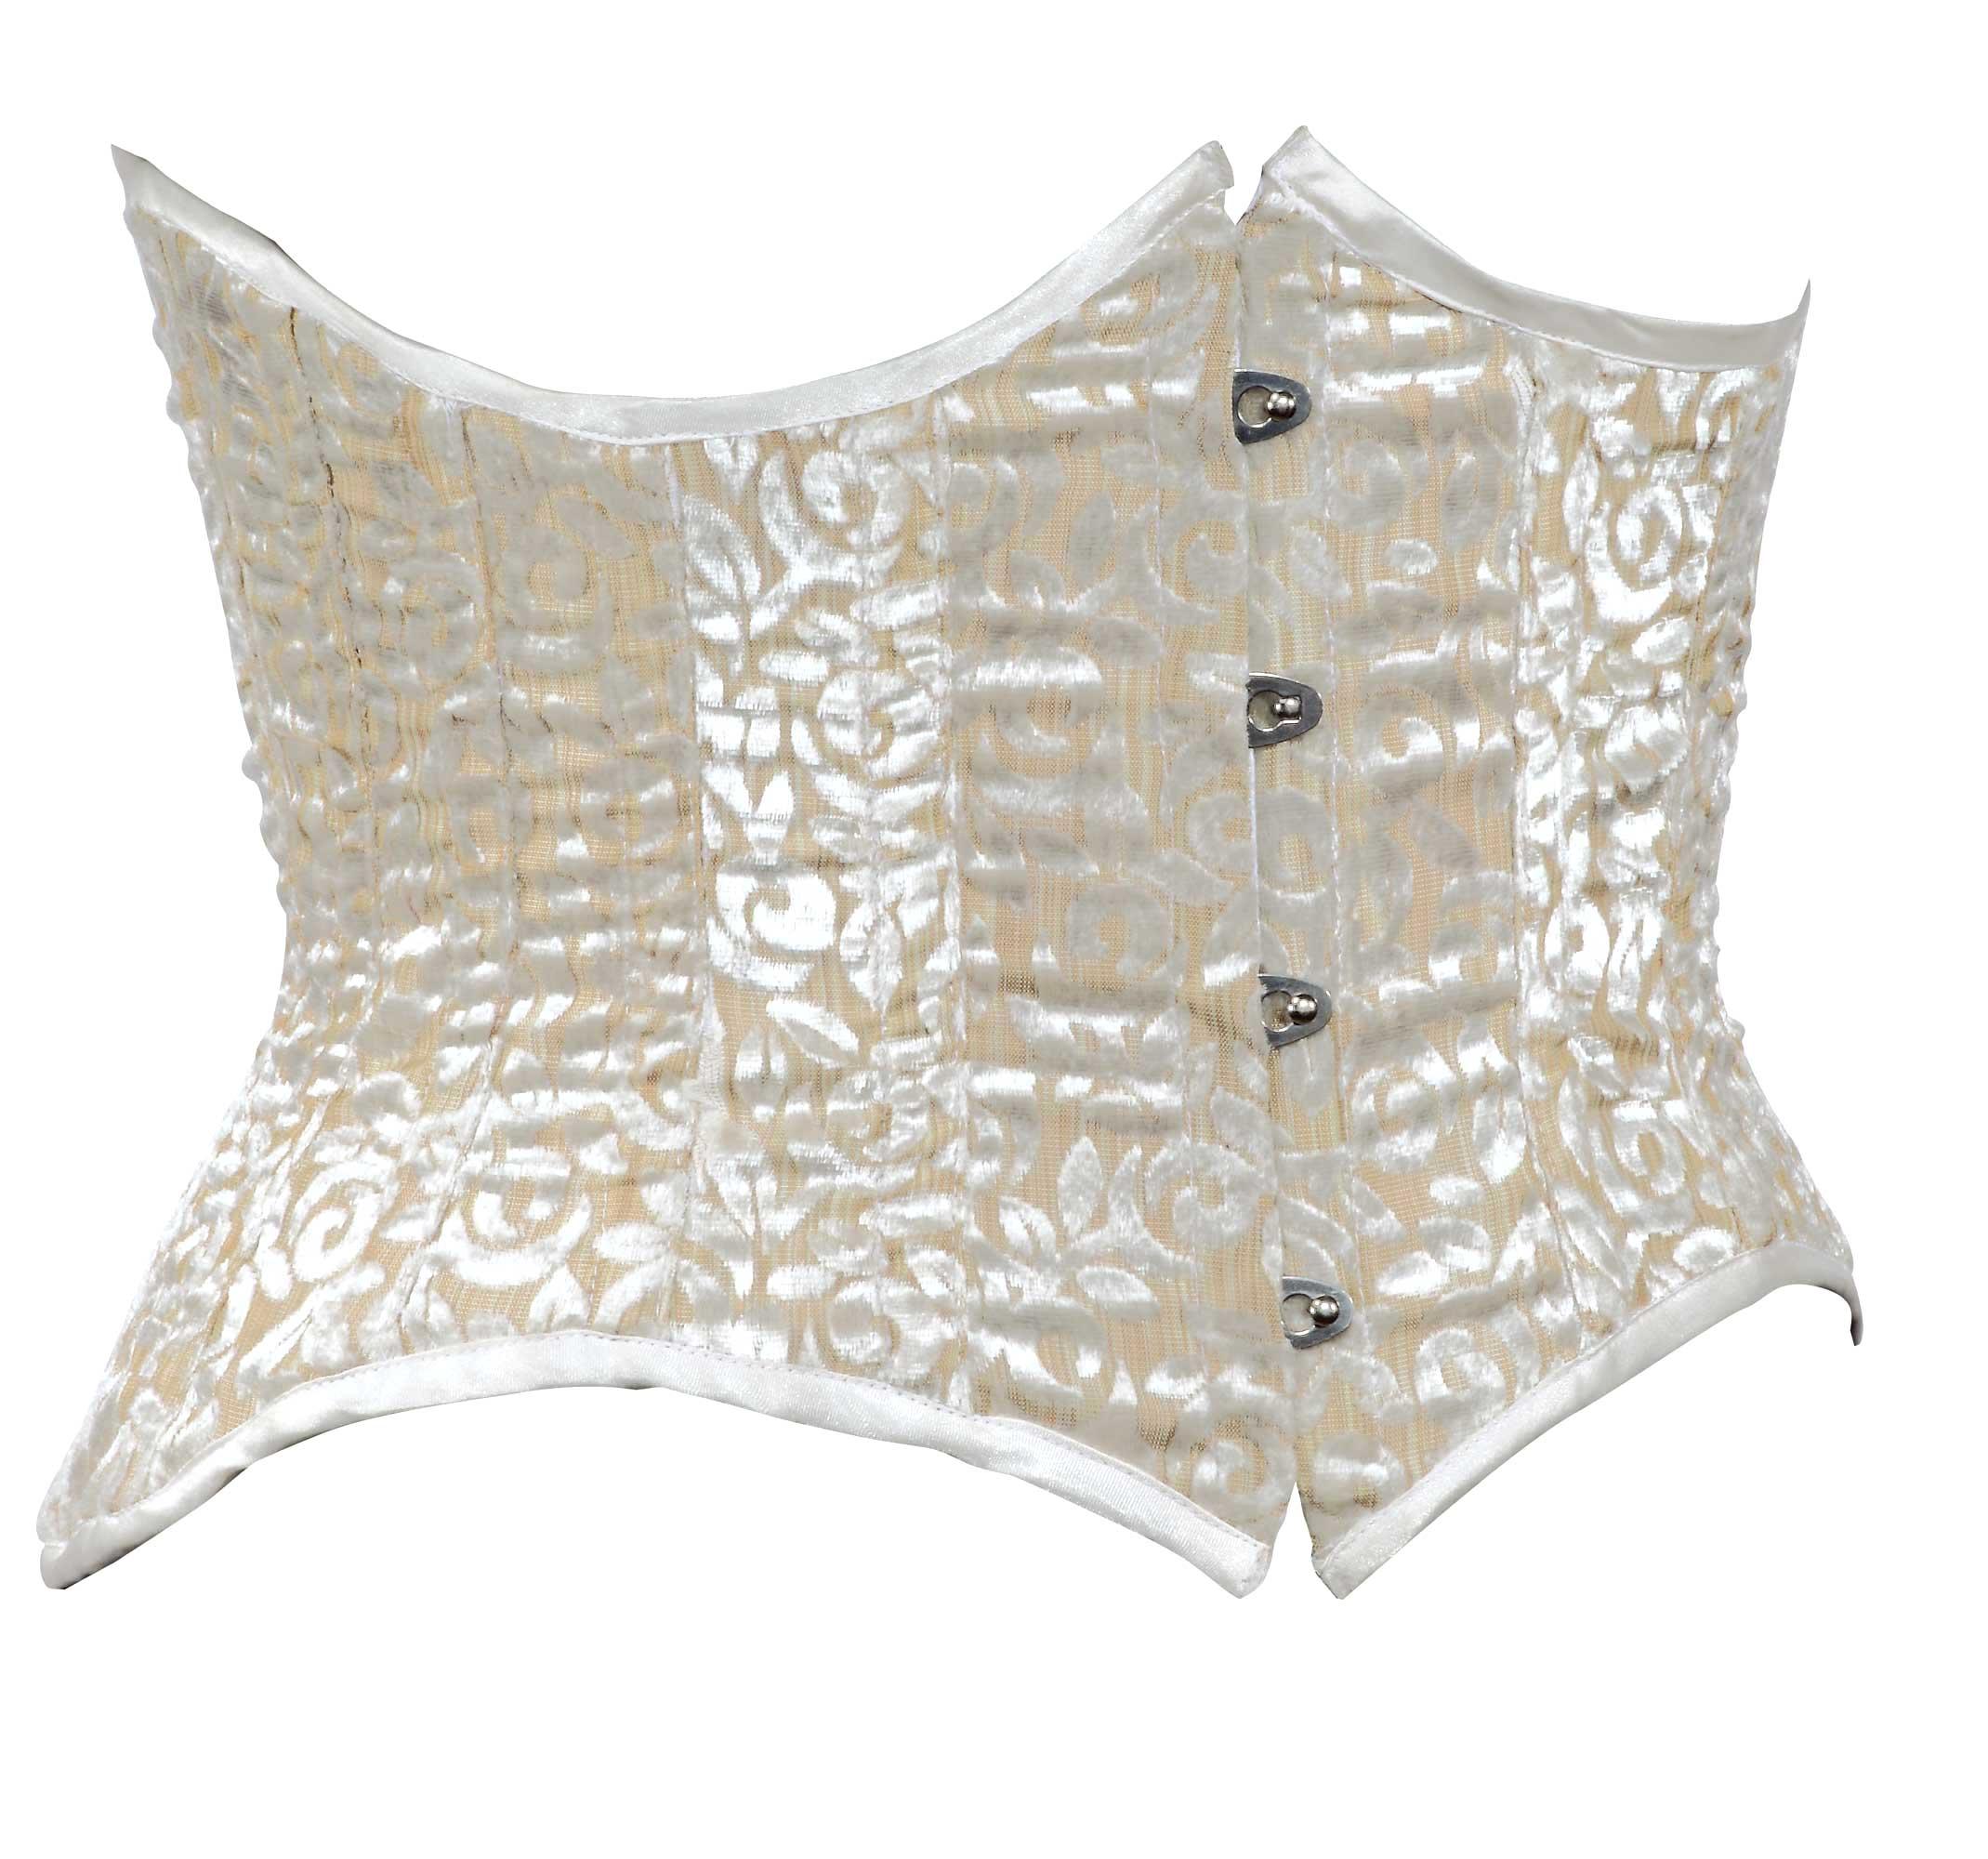 silver_floral_brasso_velvet_fabric_steel_boning_underbust_corset_waist_cincher_bustier_bustiers_and_corsets_4.jpg